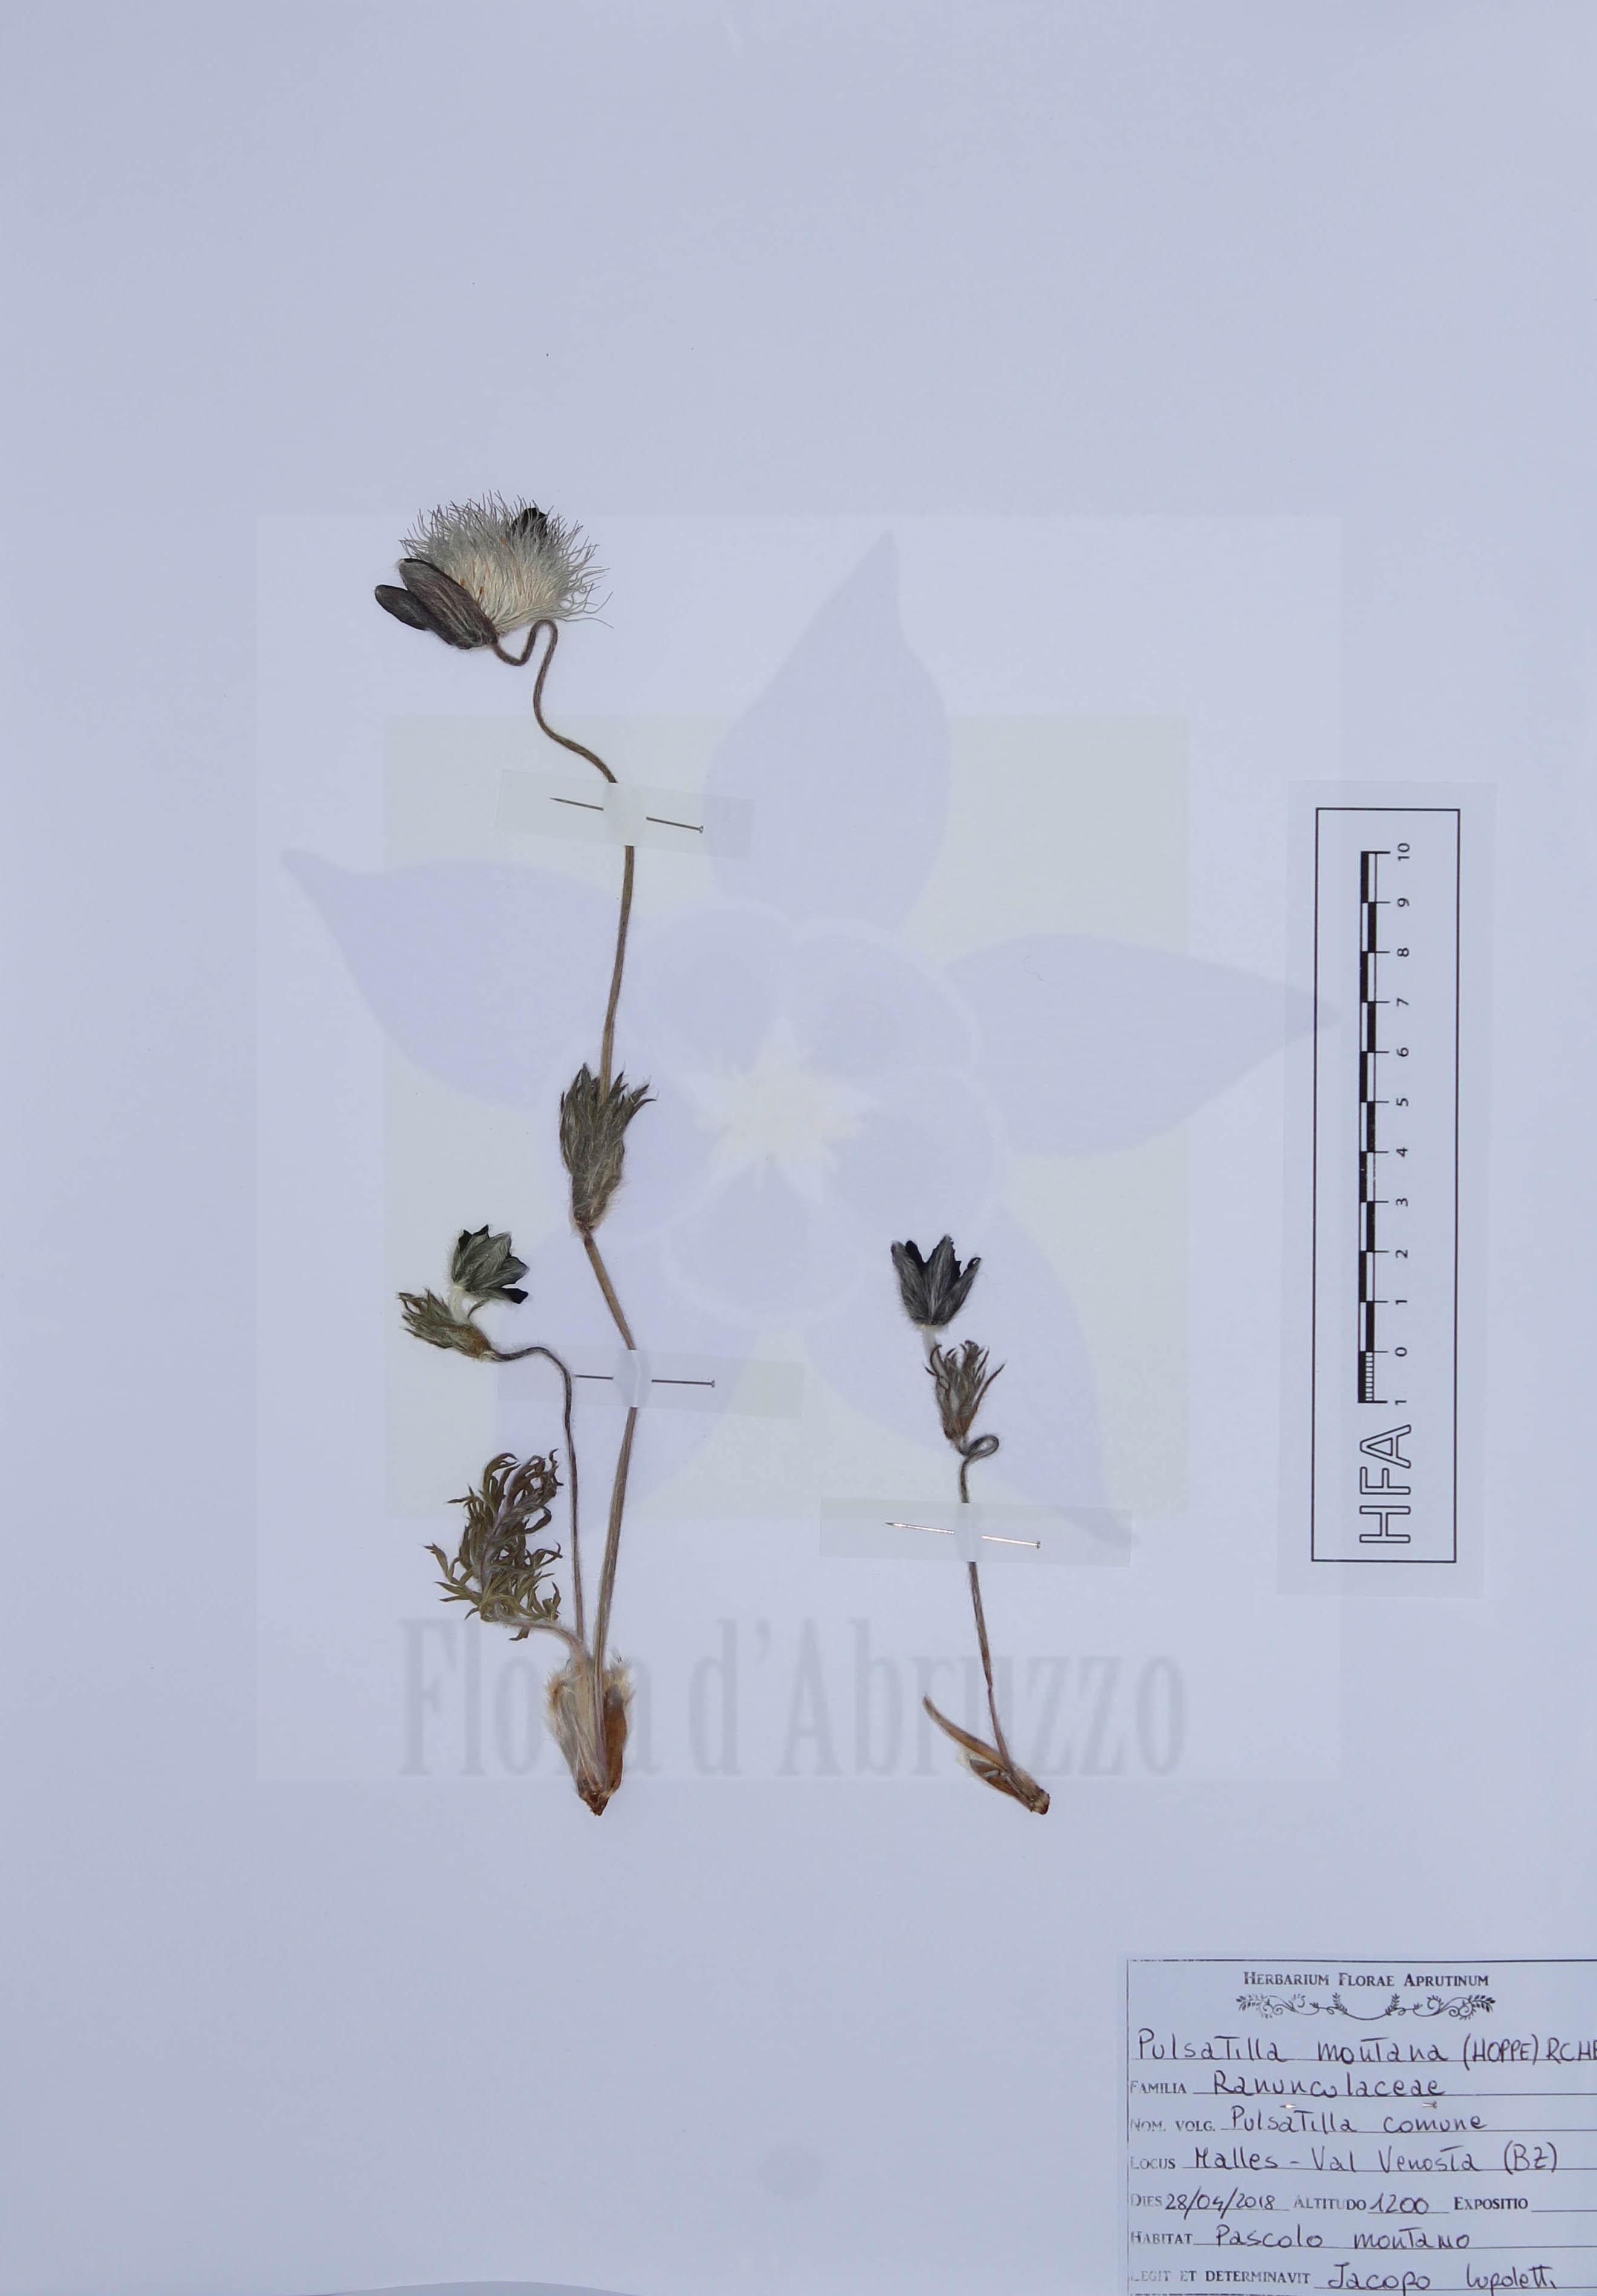 Pulsatilla montana (Hoppe) Rchb.